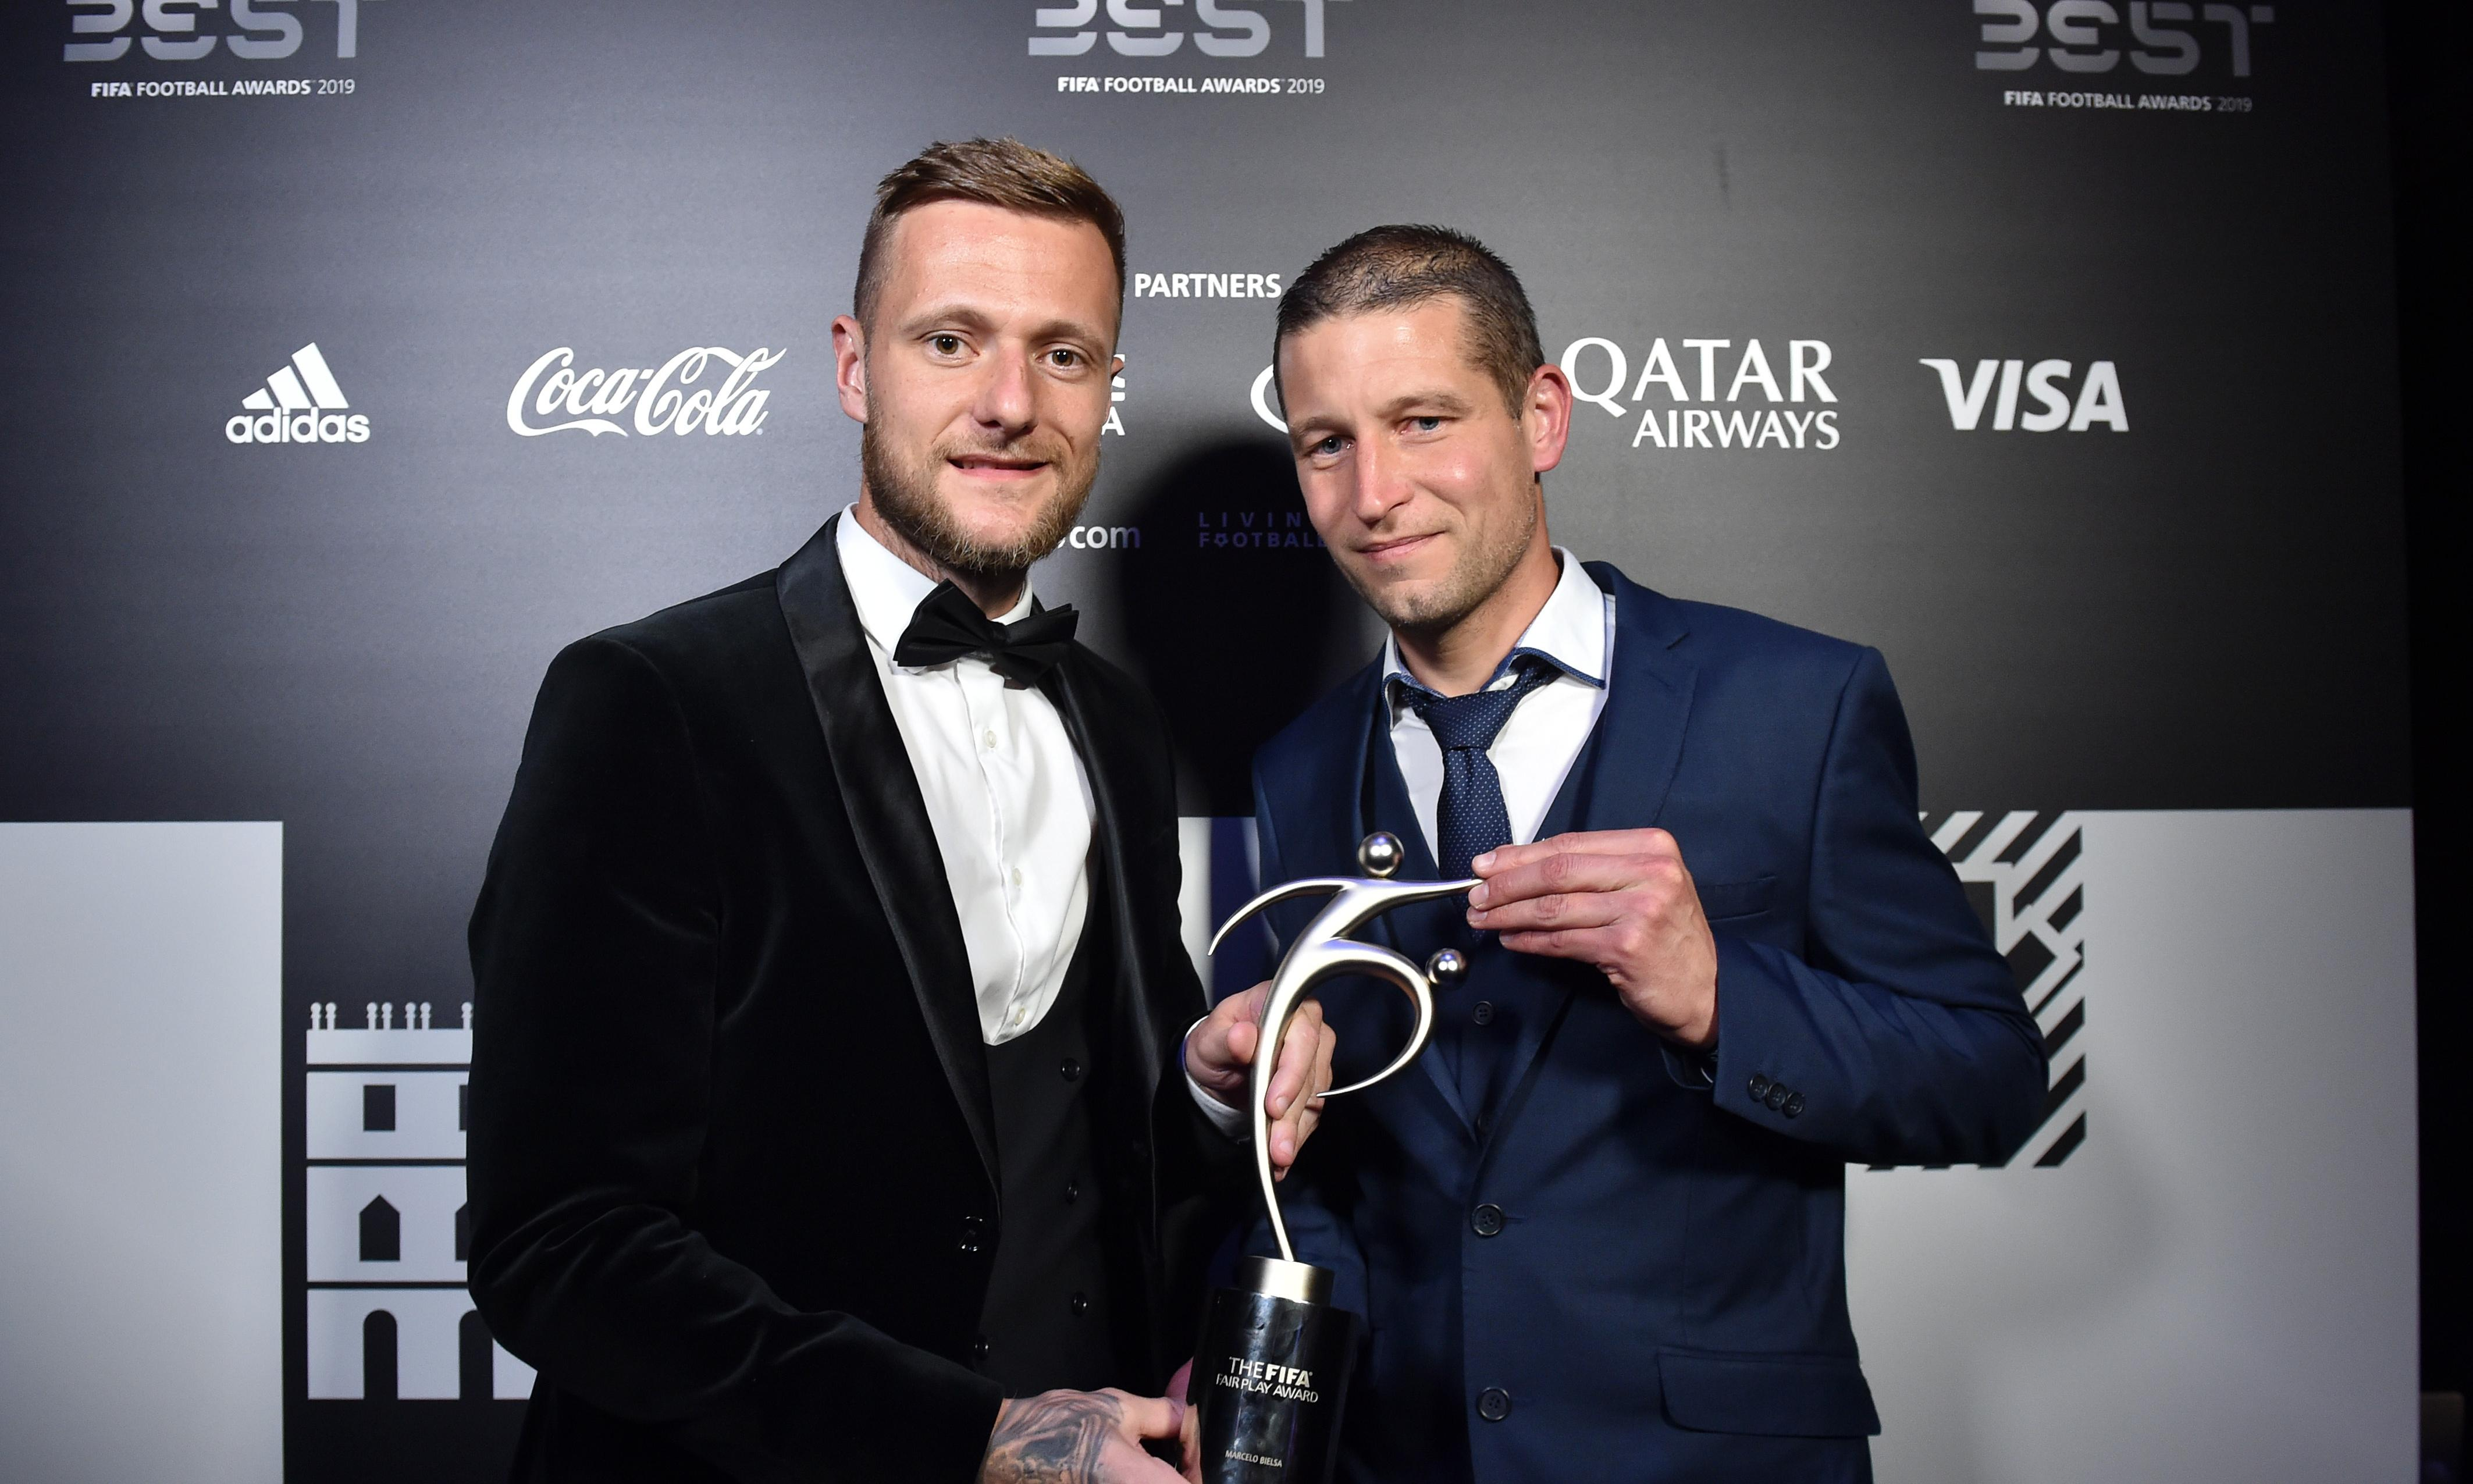 Leeds United and Marcelo Bielsa win Fifa fair play award for Aston Villa game